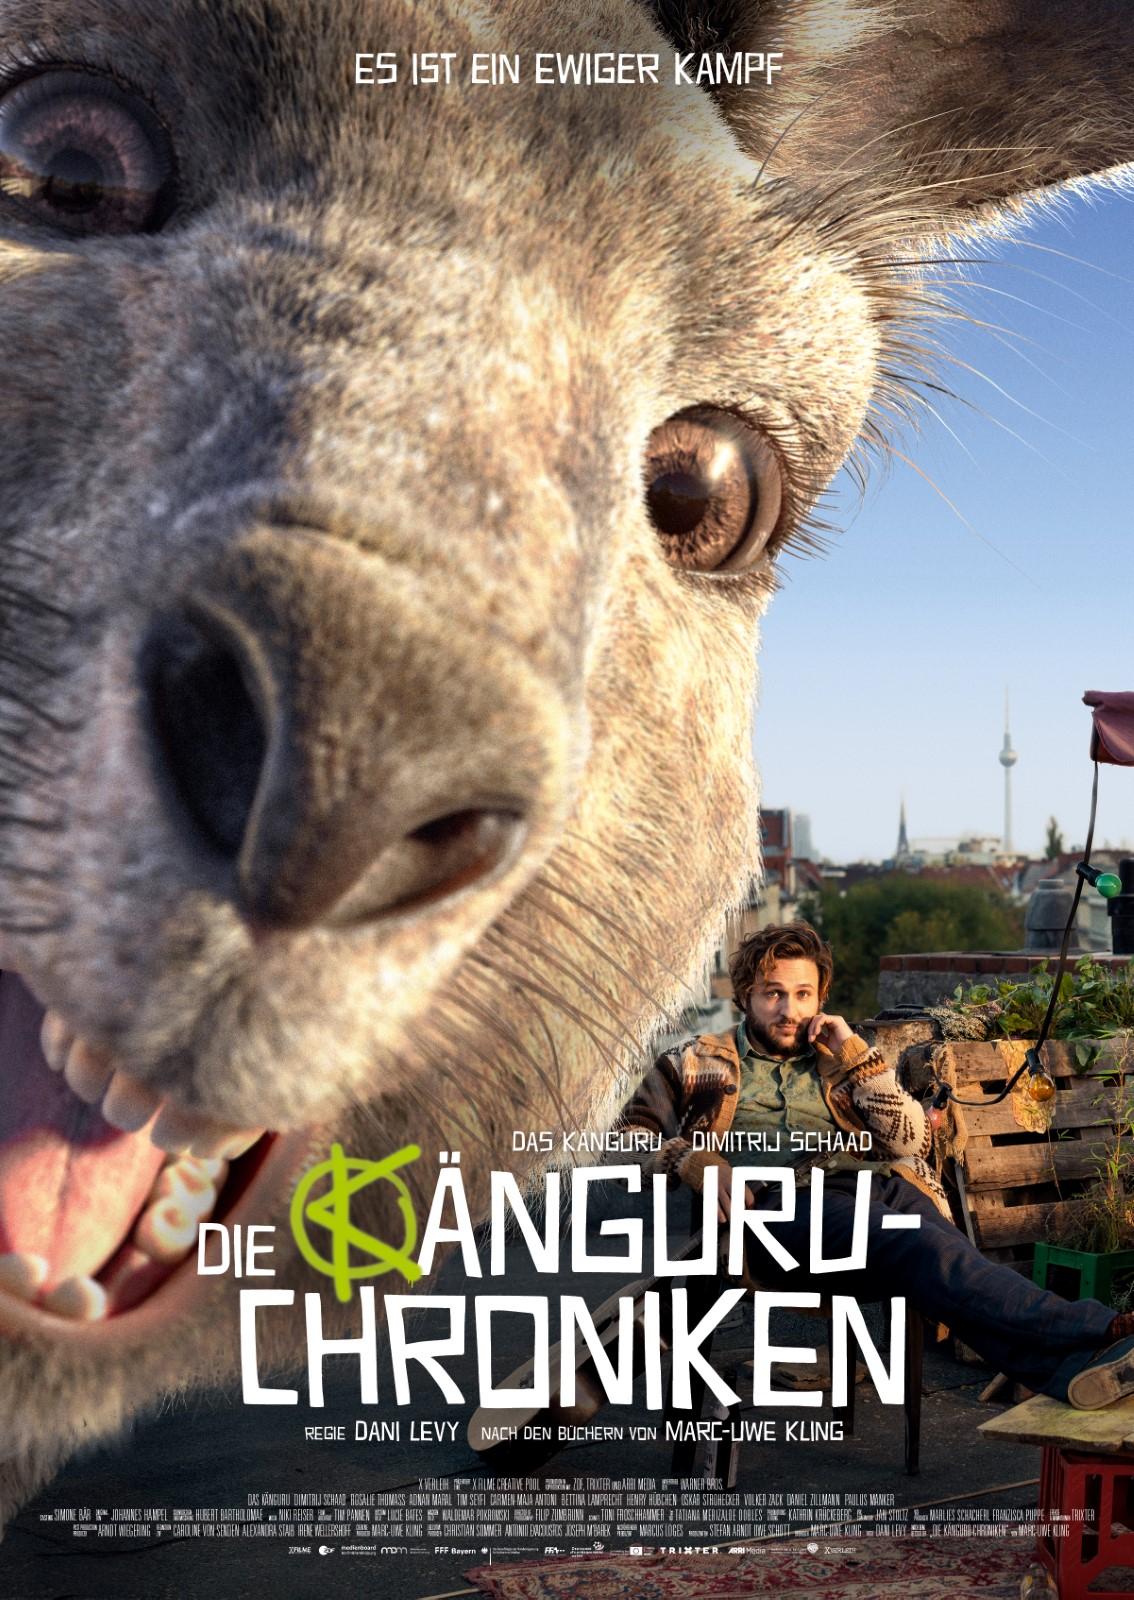 [amazon] [iTunes] Die Känguru-Chroniken in HD leihen